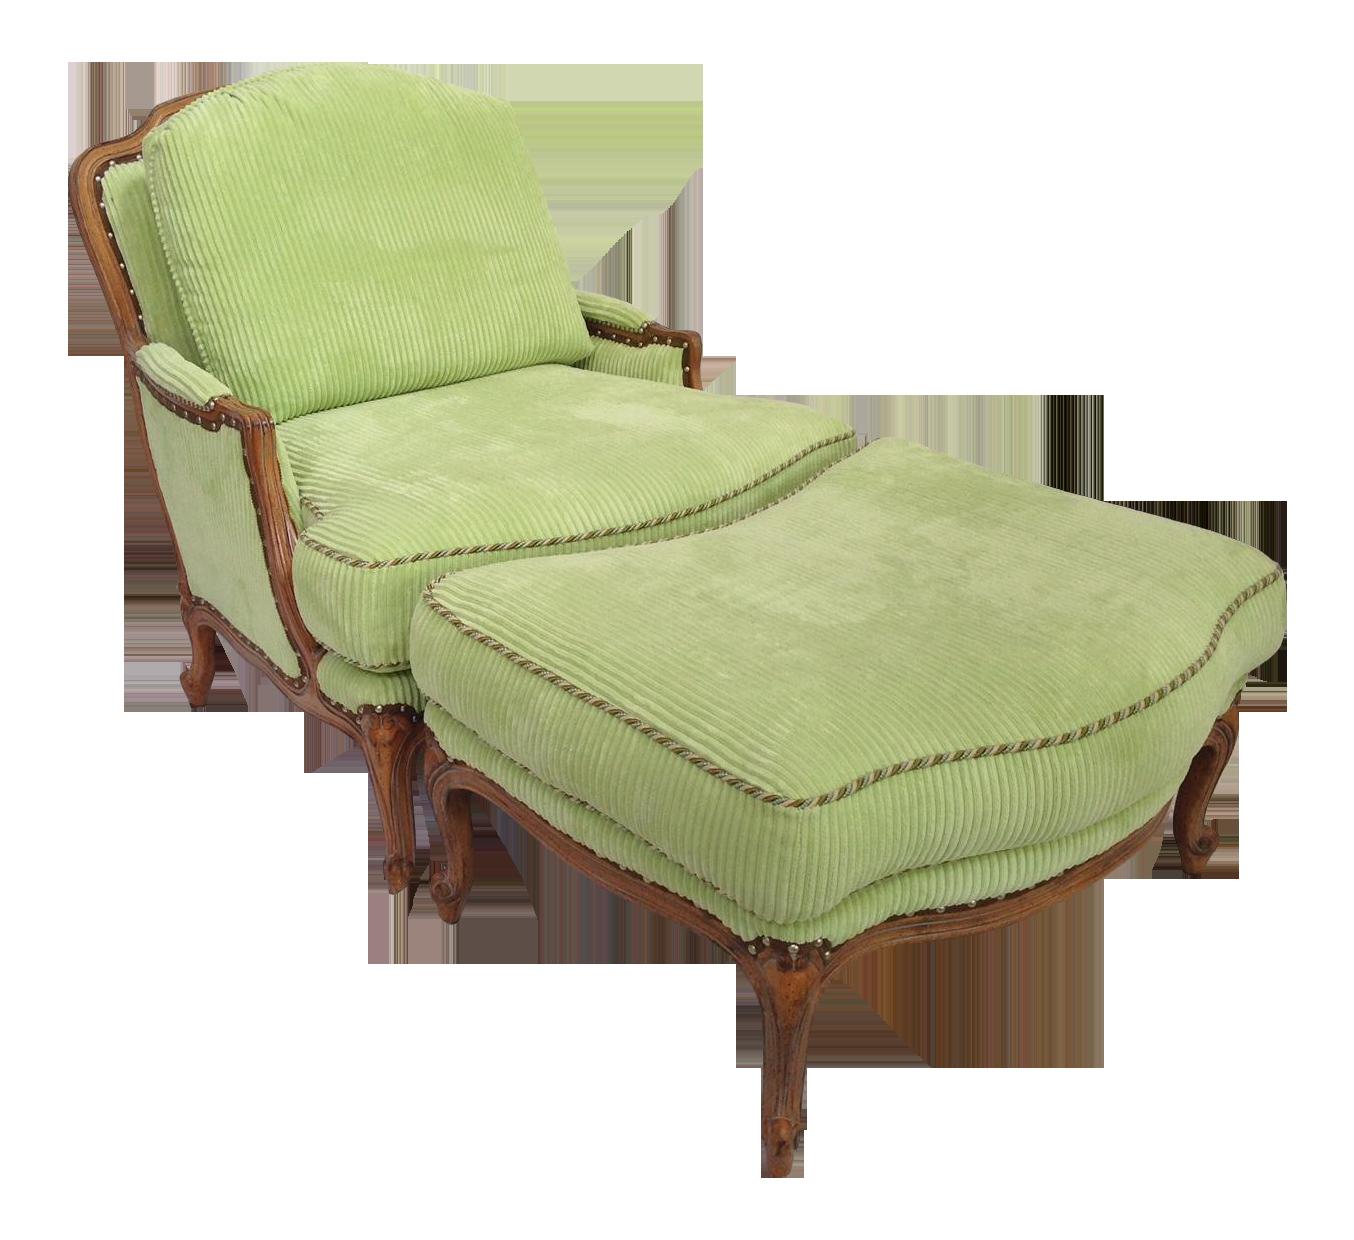 Bergere chair and ottoman - Bergere Chair And Ottoman 1